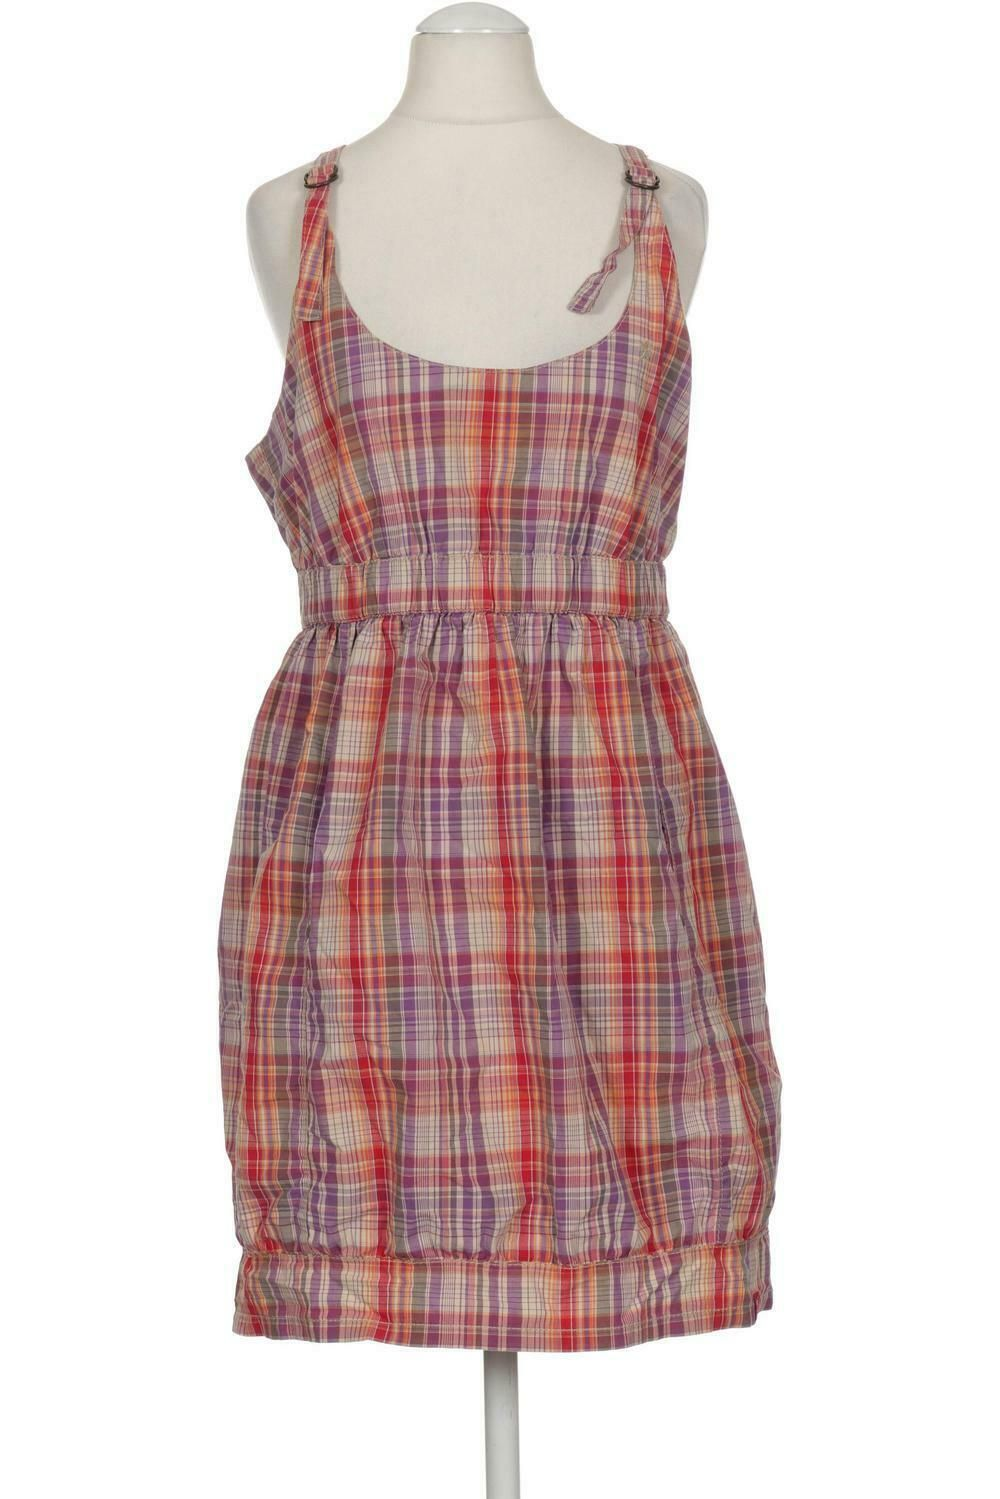 Esprit Kleid Damen Dress Damenkleid Gr. INT S Baumwolle lila